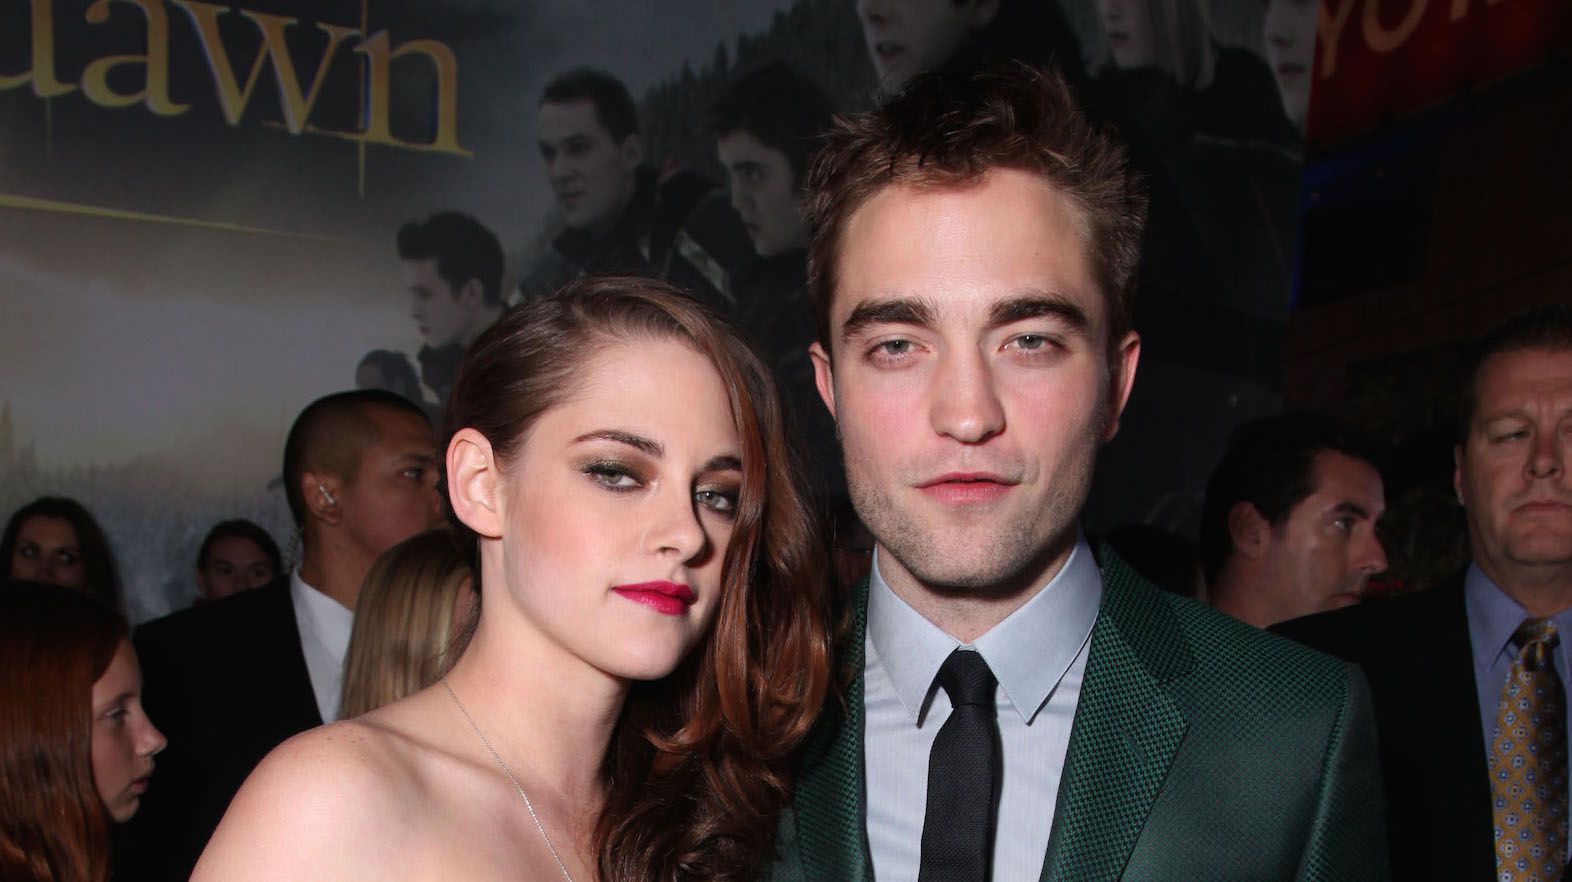 Kristen Stewart og Robert Pattinson dating 2012 bagel tid dating